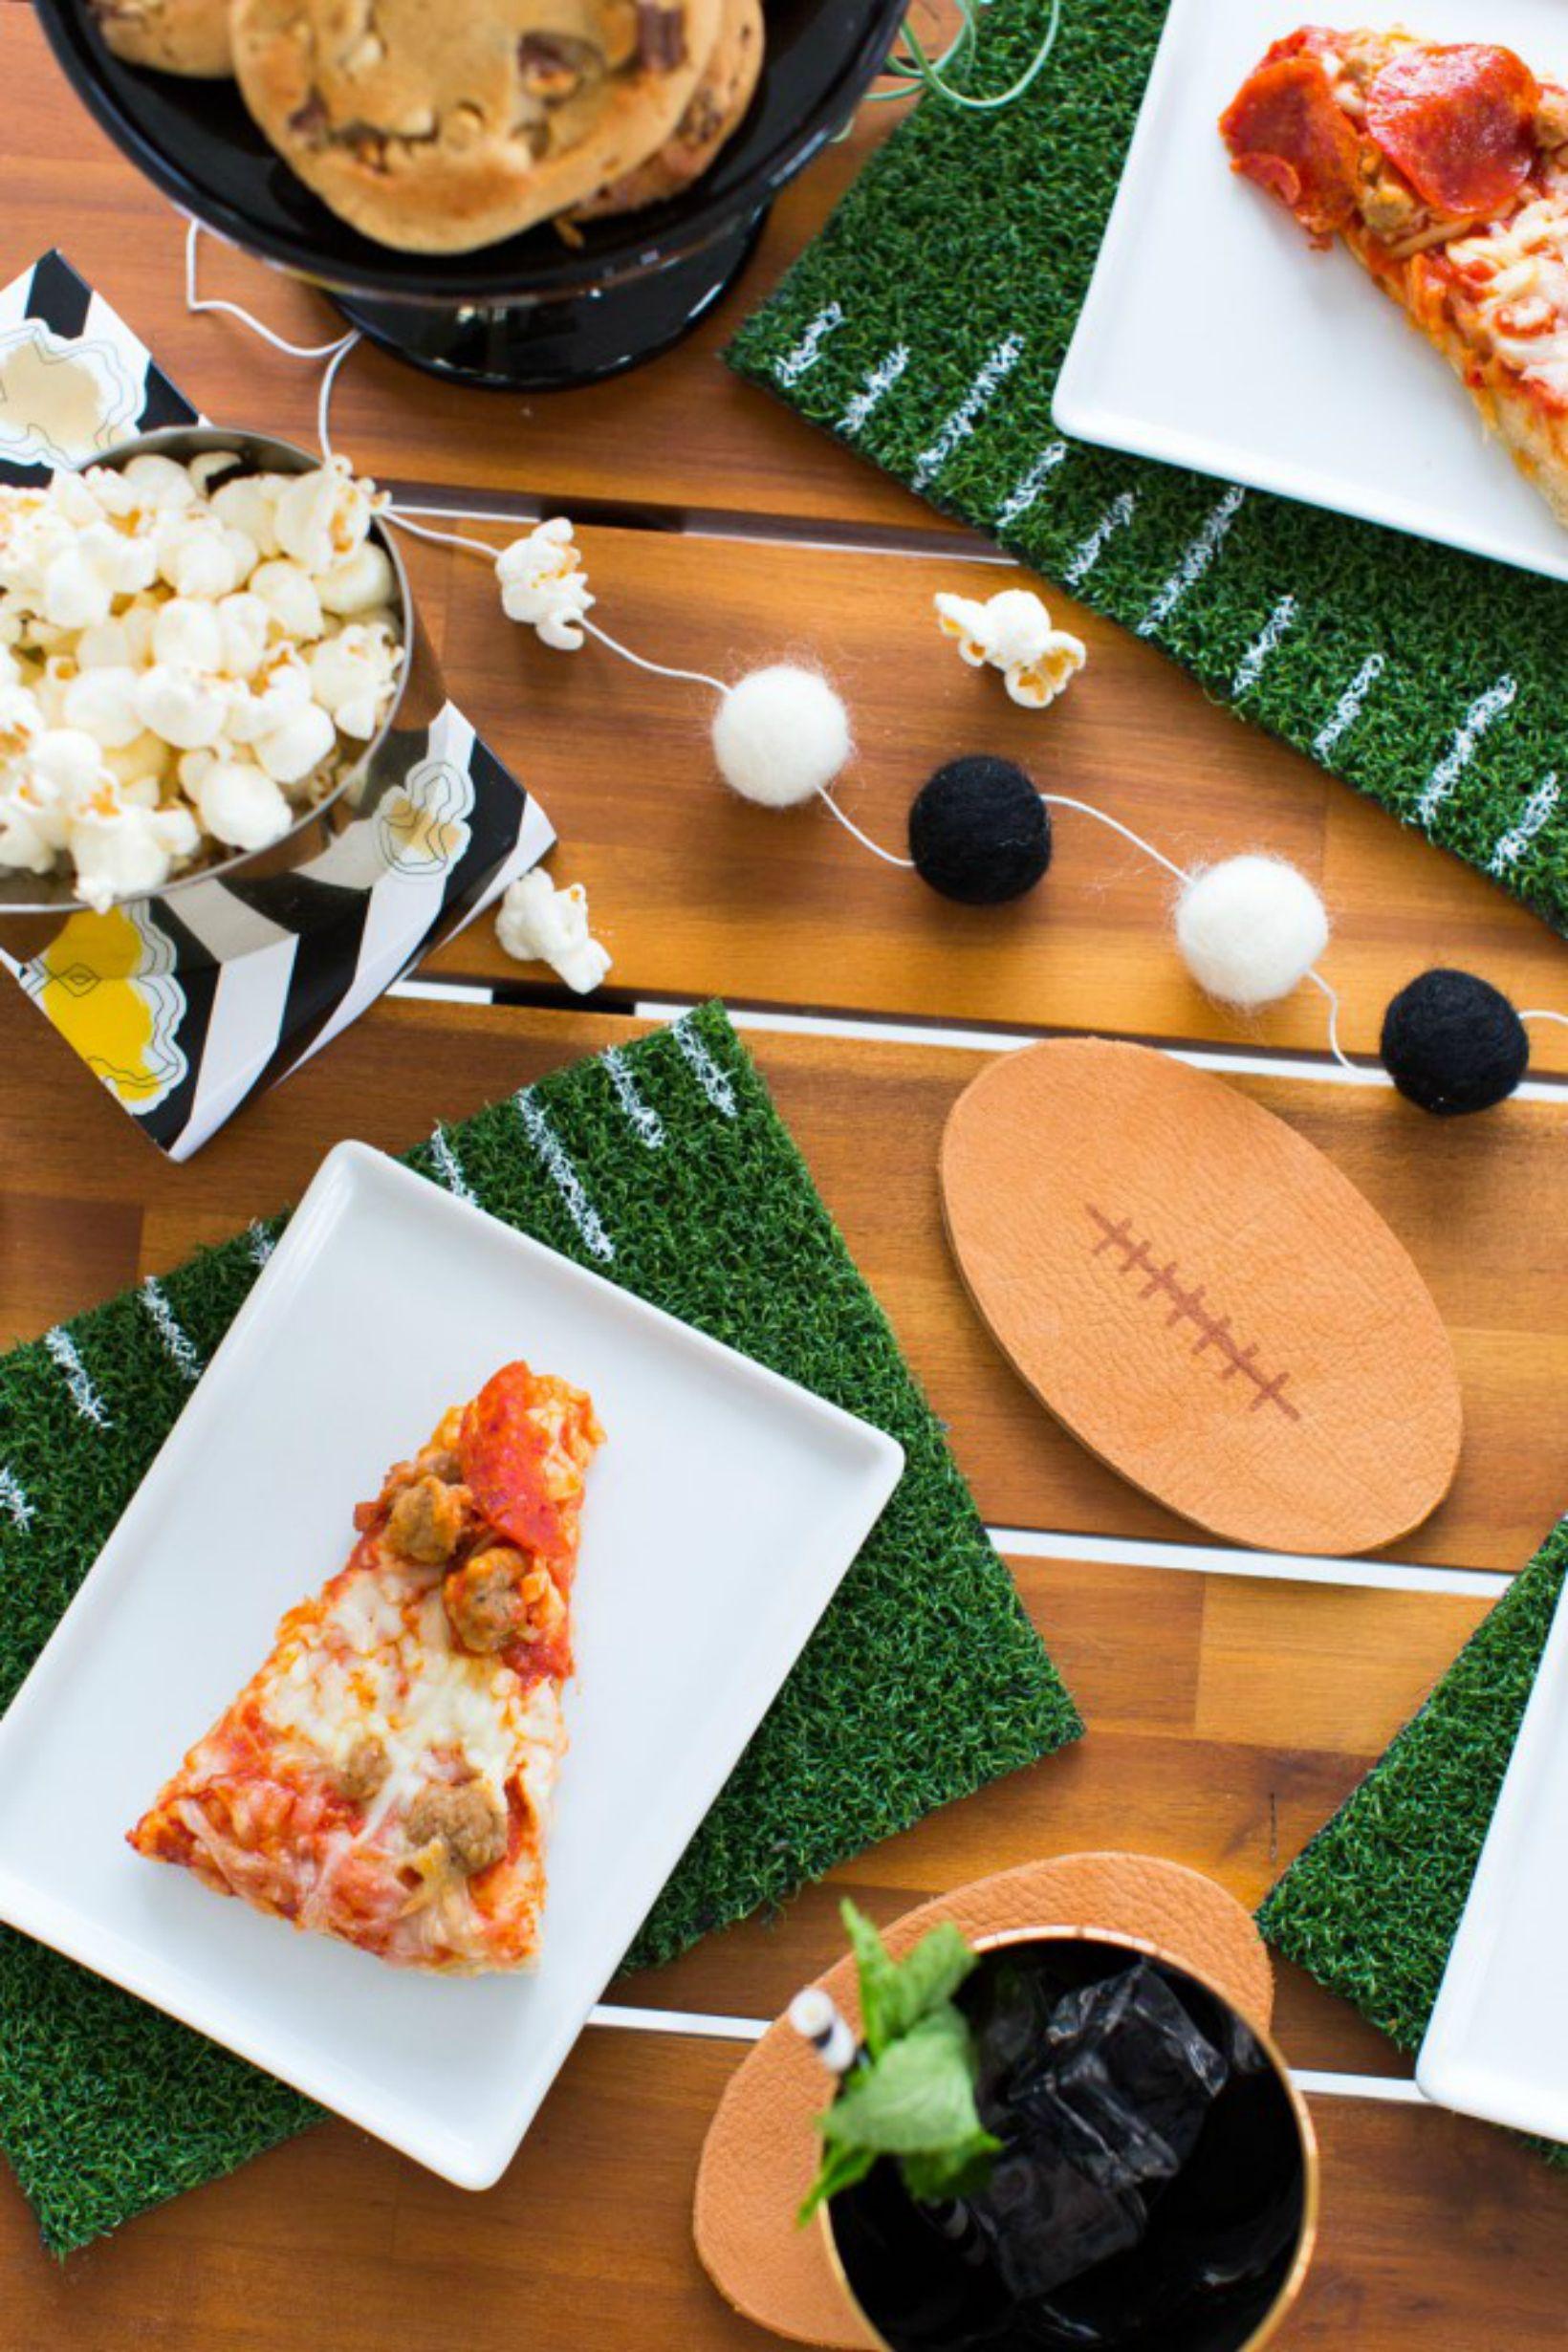 party decorations diy easy bowl super ideas superbowl creative juice sunday decor snacks